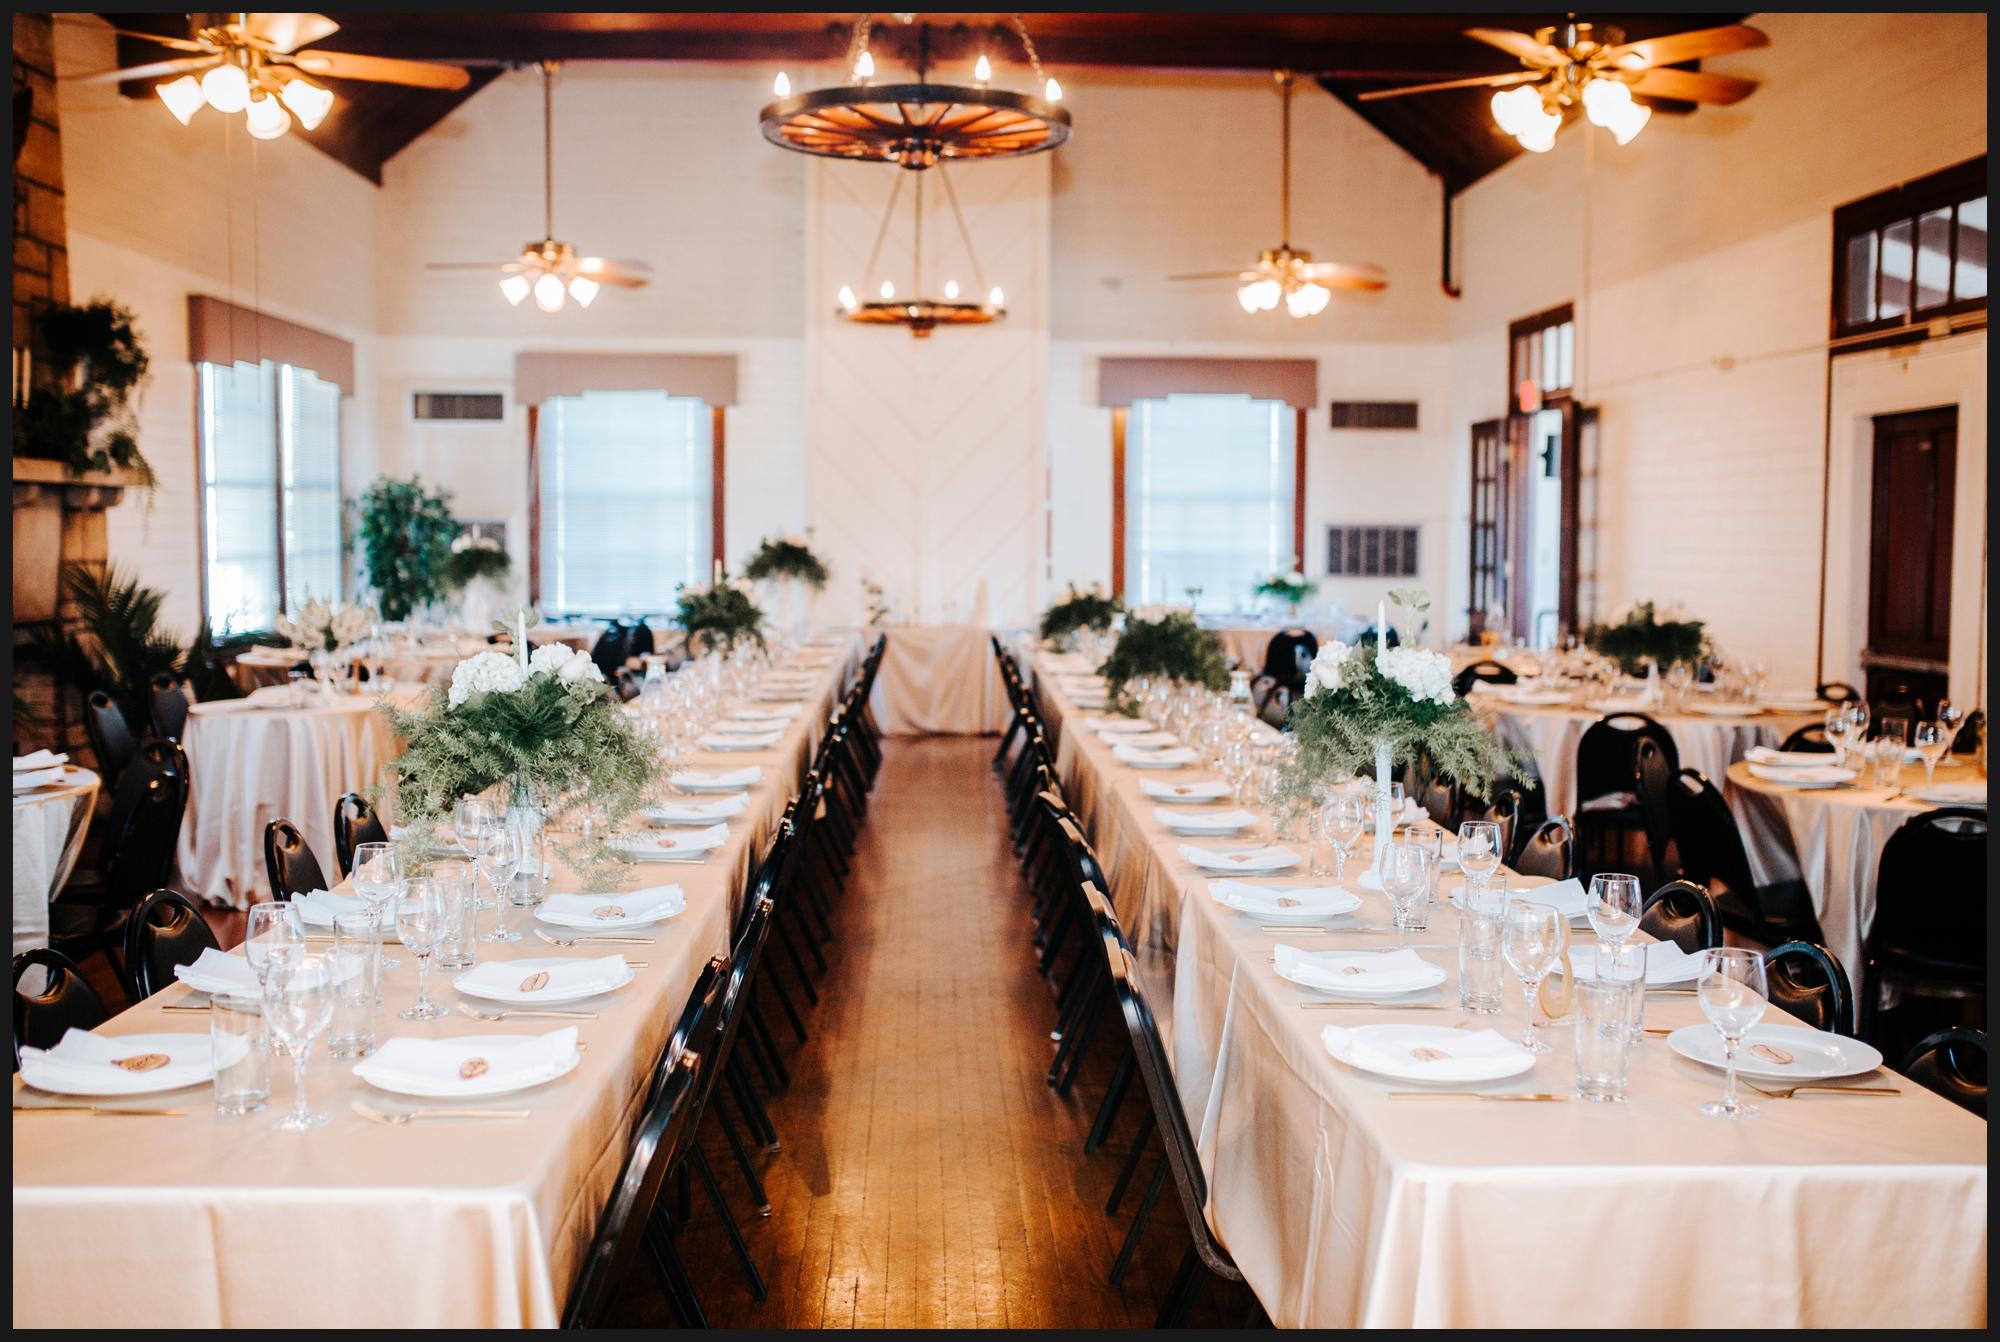 Orlando-Wedding-Photographer-destination-wedding-photographer-florida-wedding-photographer-bohemian-wedding-photographer_0091.jpg